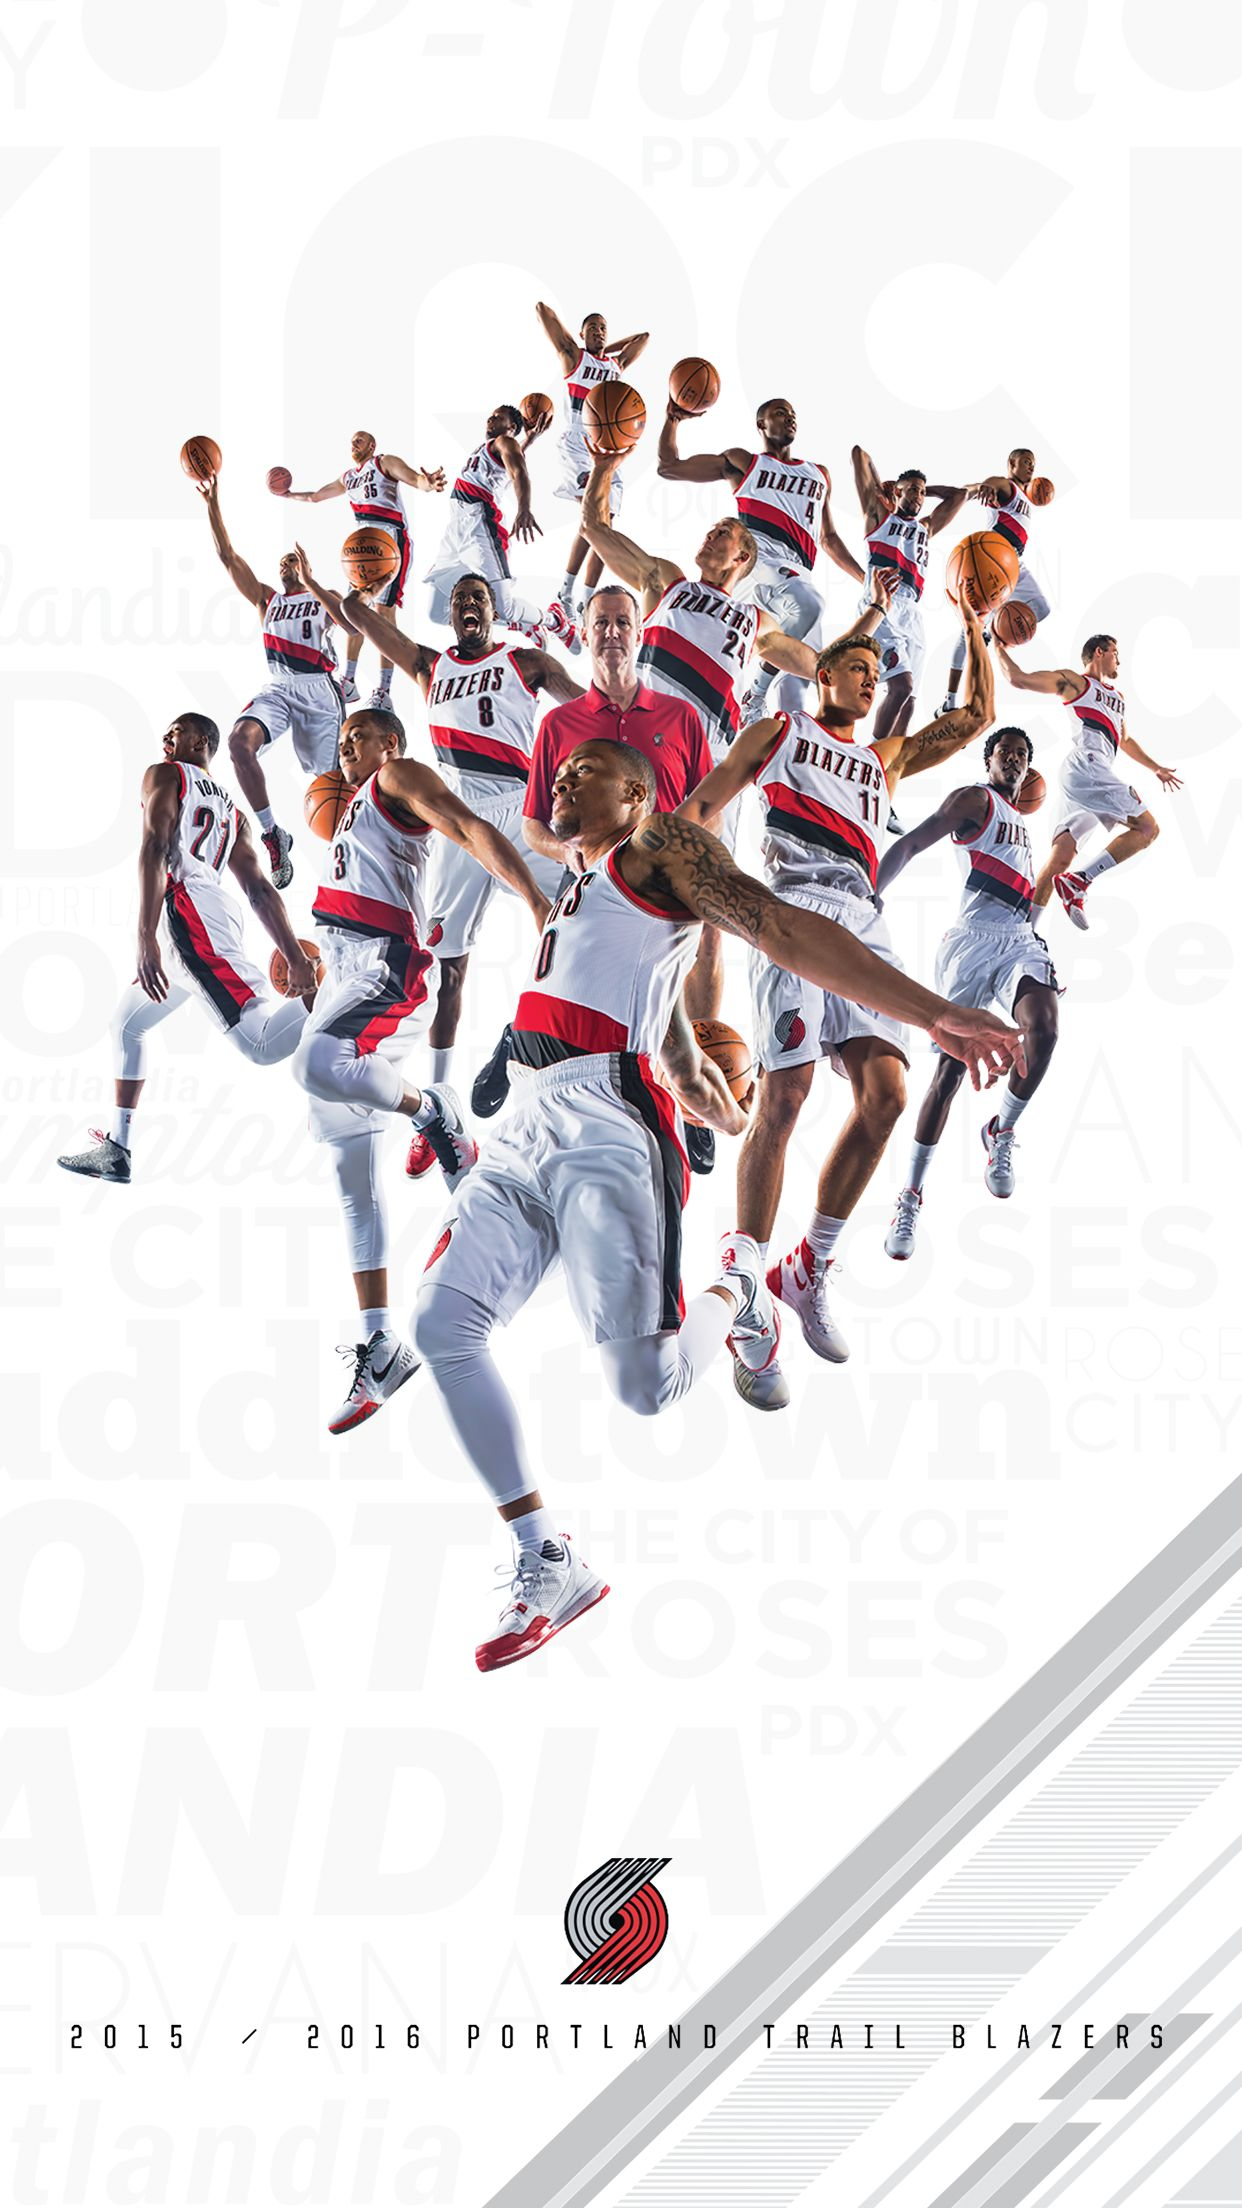 Lebron James Nba Basketball Dunk Iphone Wallpaper Wallpapers Hd